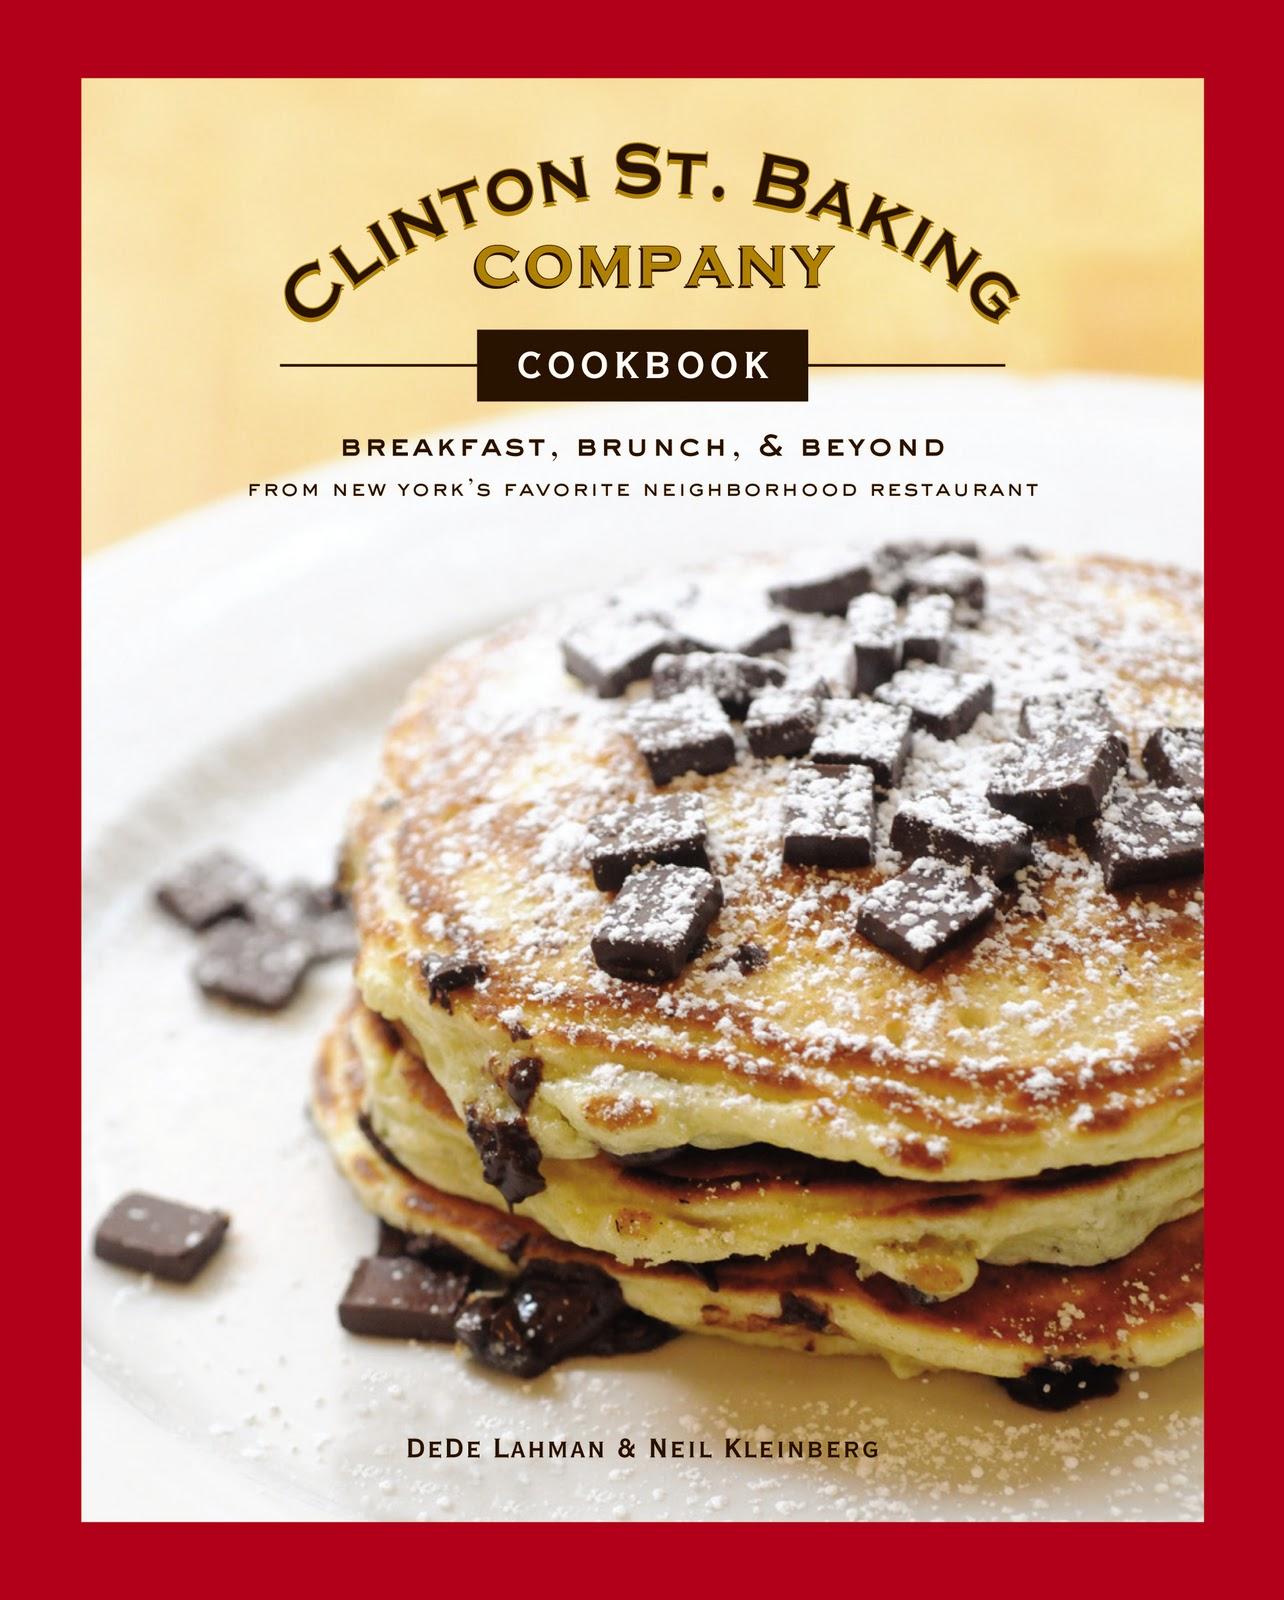 Taco Tuesday: Clinton Street Baking Company Blueberry Pancakes